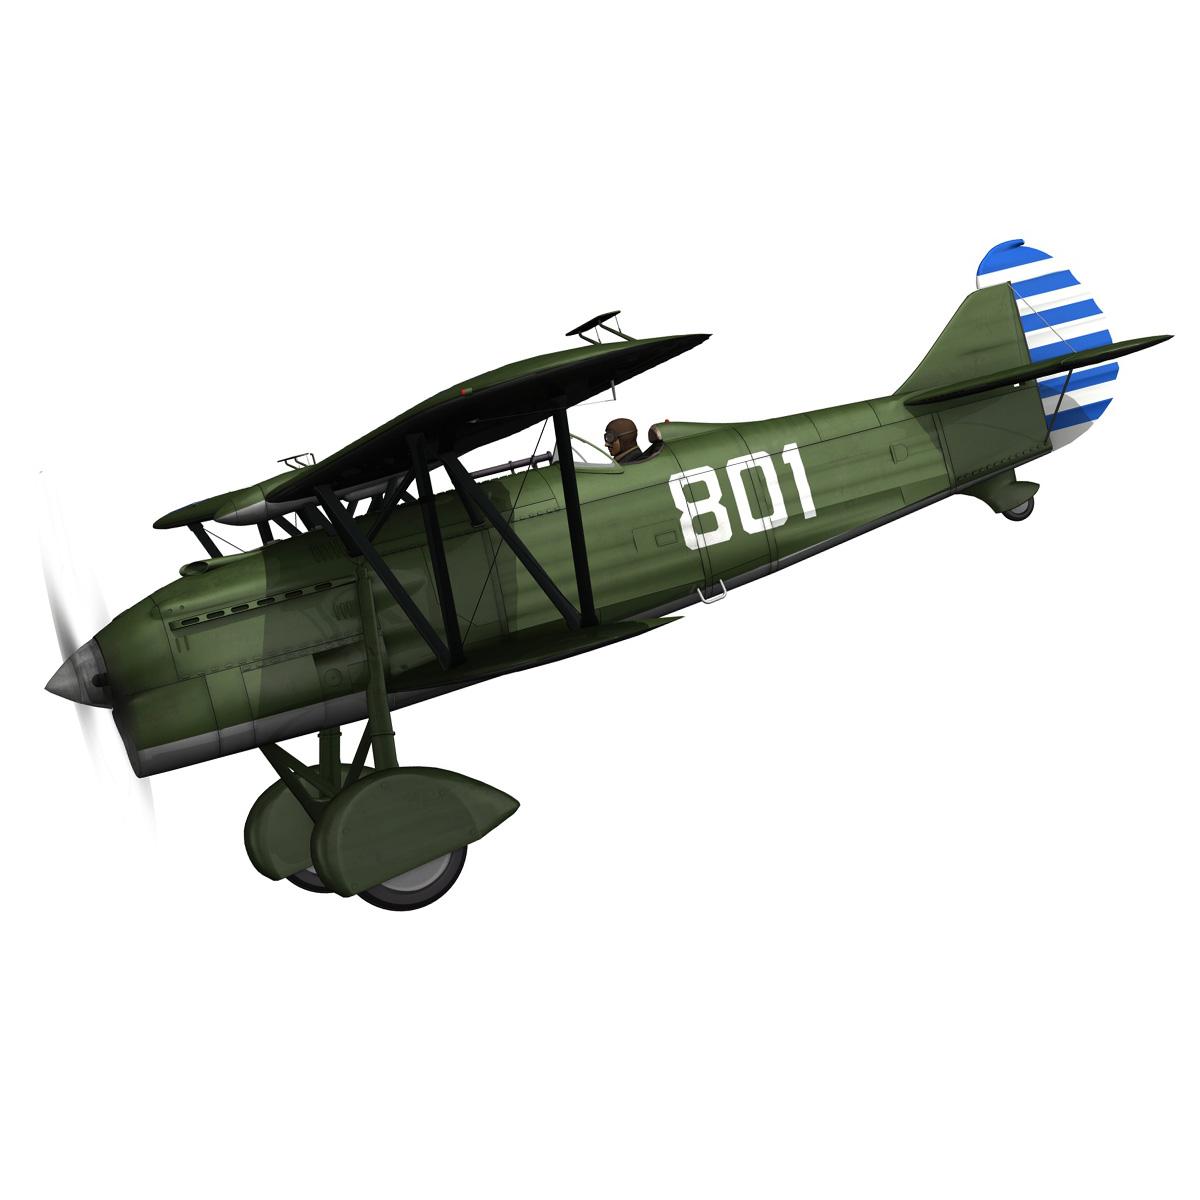 fiat cr.32 – chinese nationalist air force 3d model fbx c4d lwo obj 272632